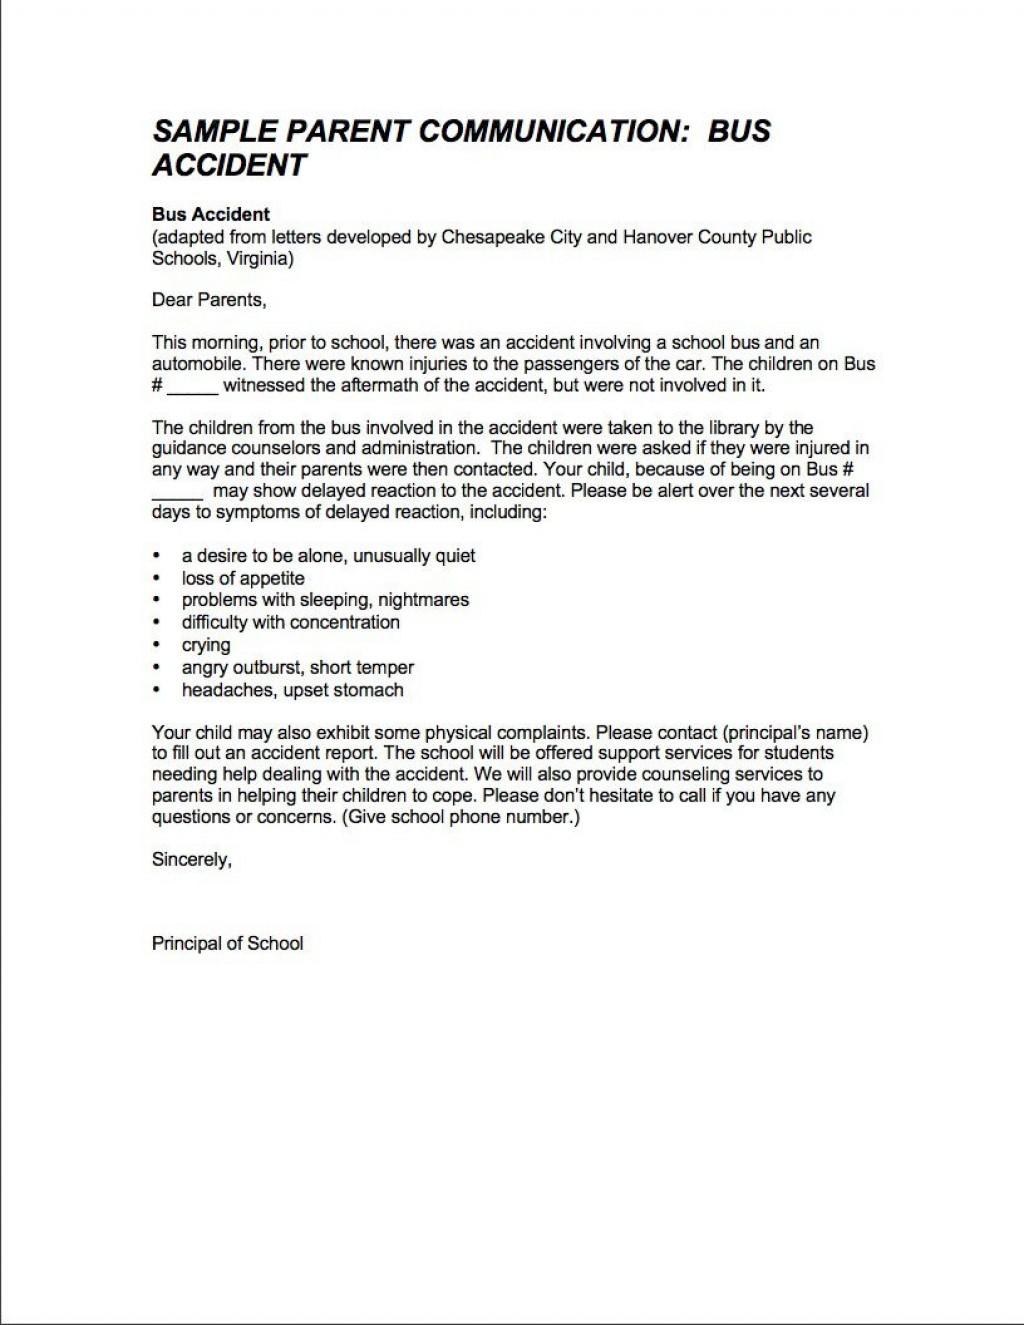 000 Impressive Crisi Communication Plan Template Photo  For Higher Education NonprofitLarge